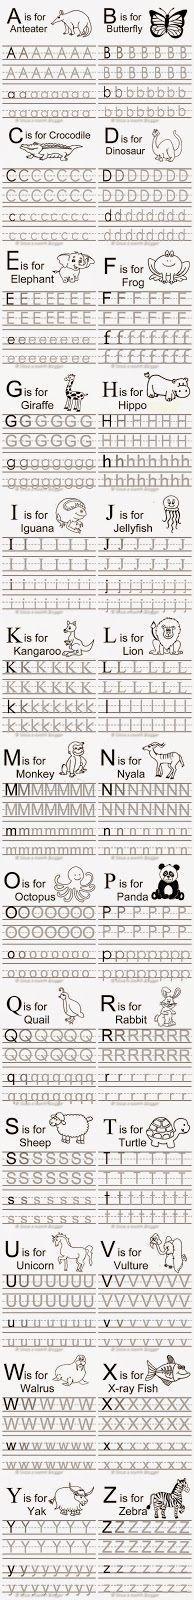 Free Animal Alphabet Traceable Letters More Preschool Letters, Letter Activities, Learning Letters, Preschool Classroom, Preschool Kindergarten, Preschool Worksheets, Preschool Learning, Tracing Letters, Alphabet Letters